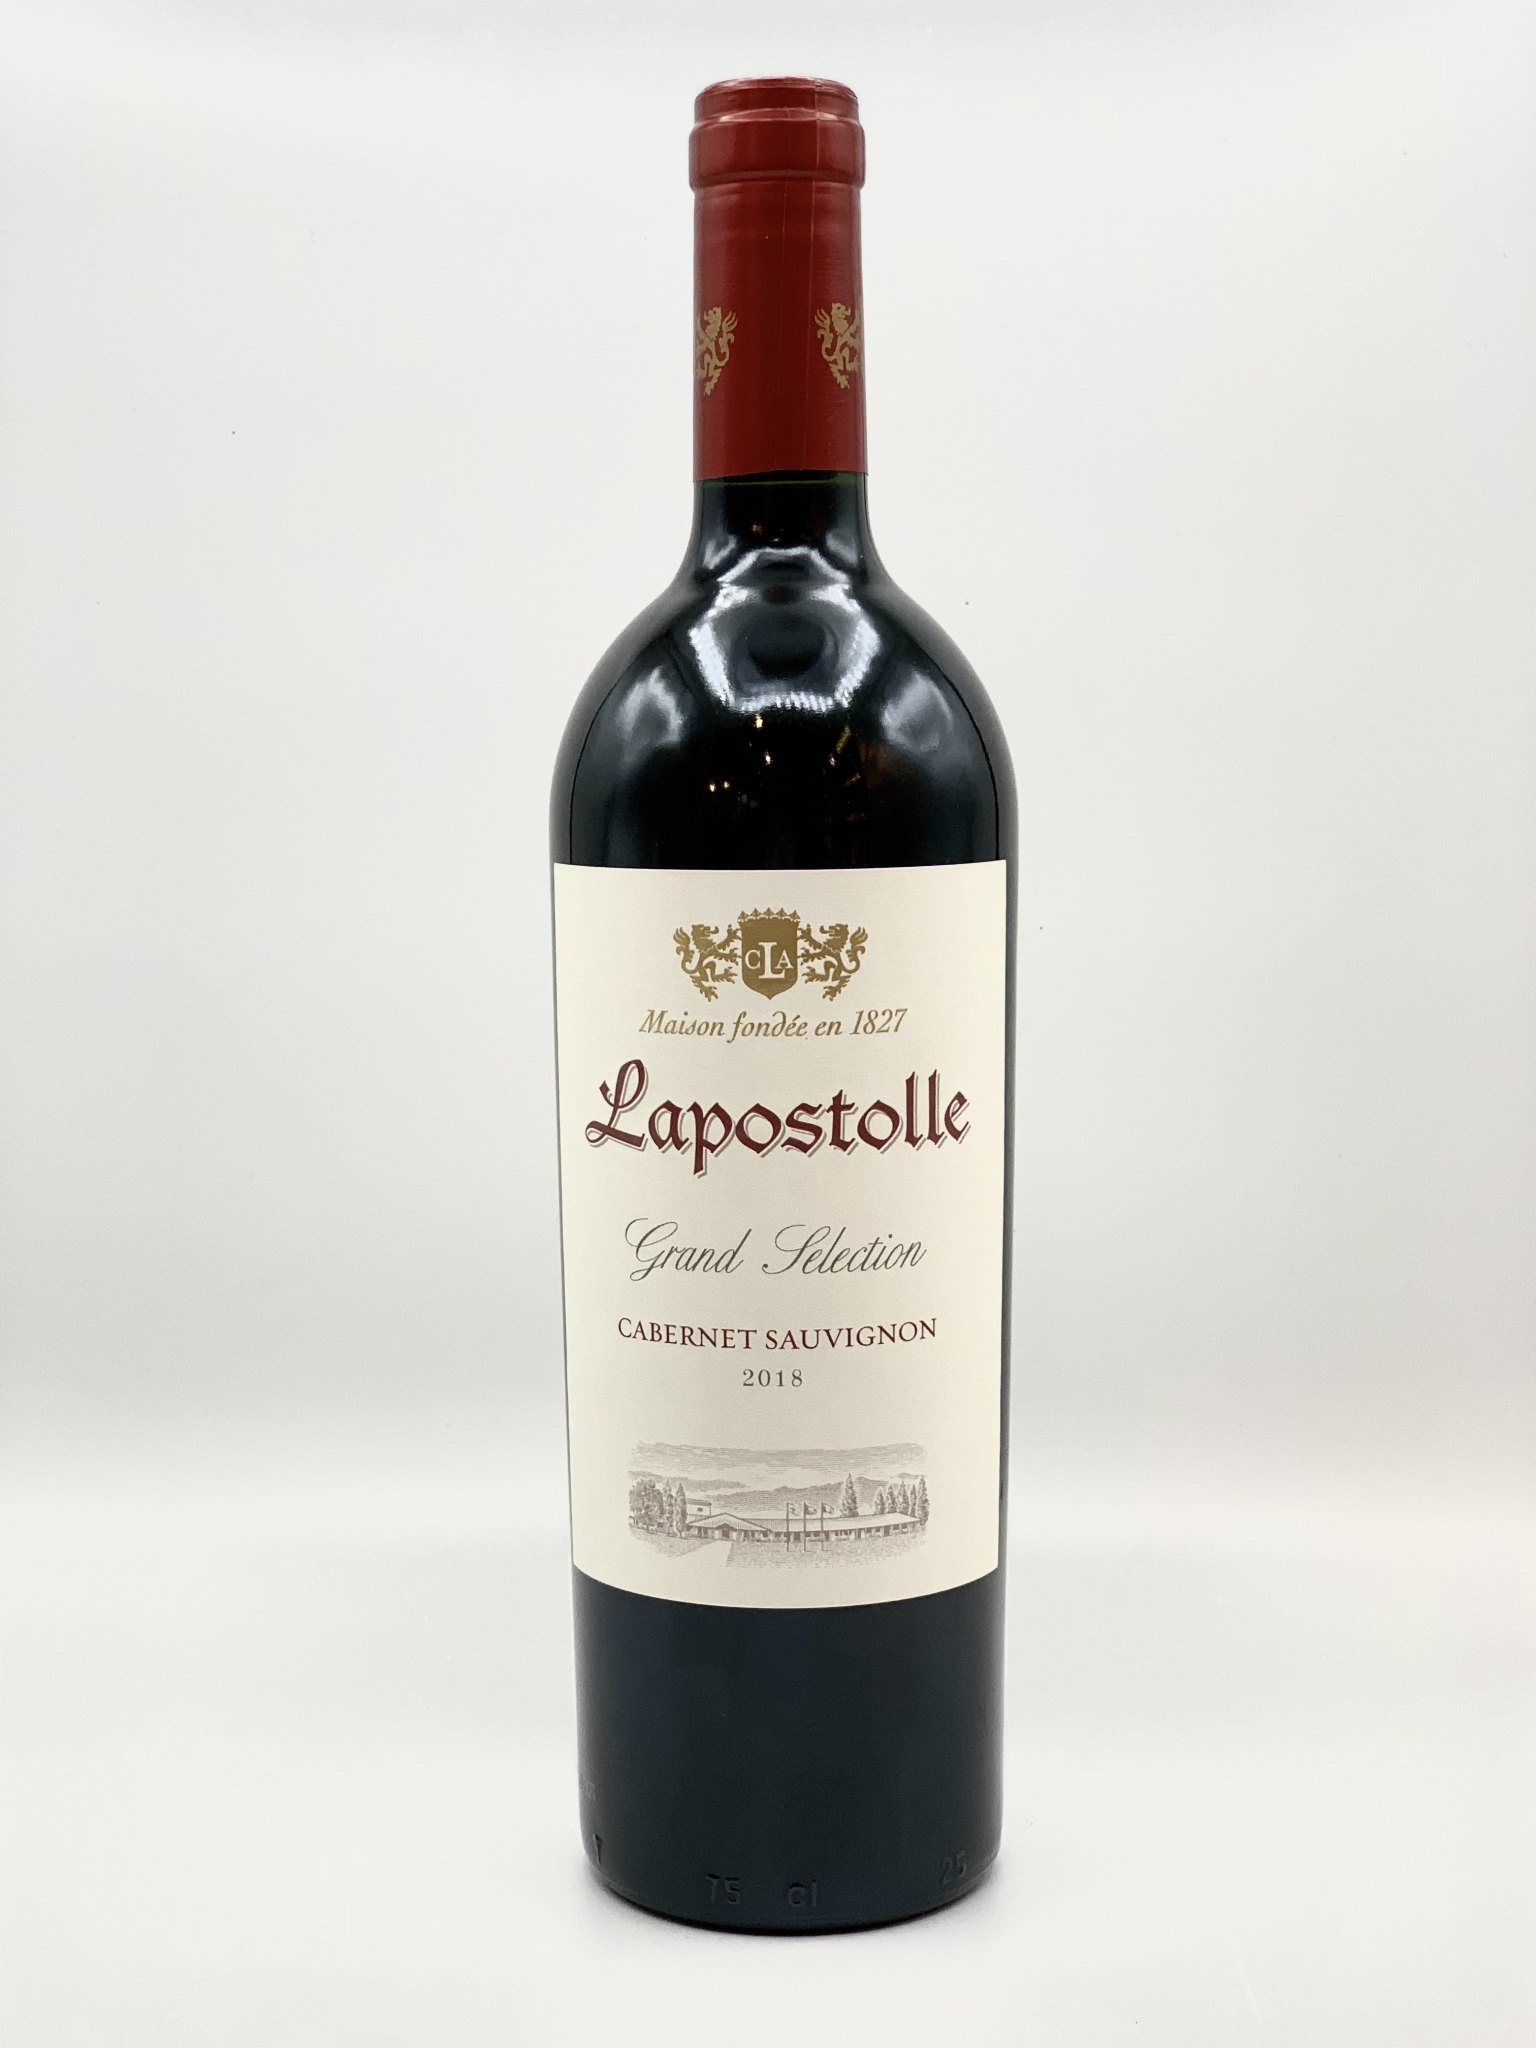 Rapel Valley Cabernet Sauvignon 2018 Lapostolle Wines  750ml